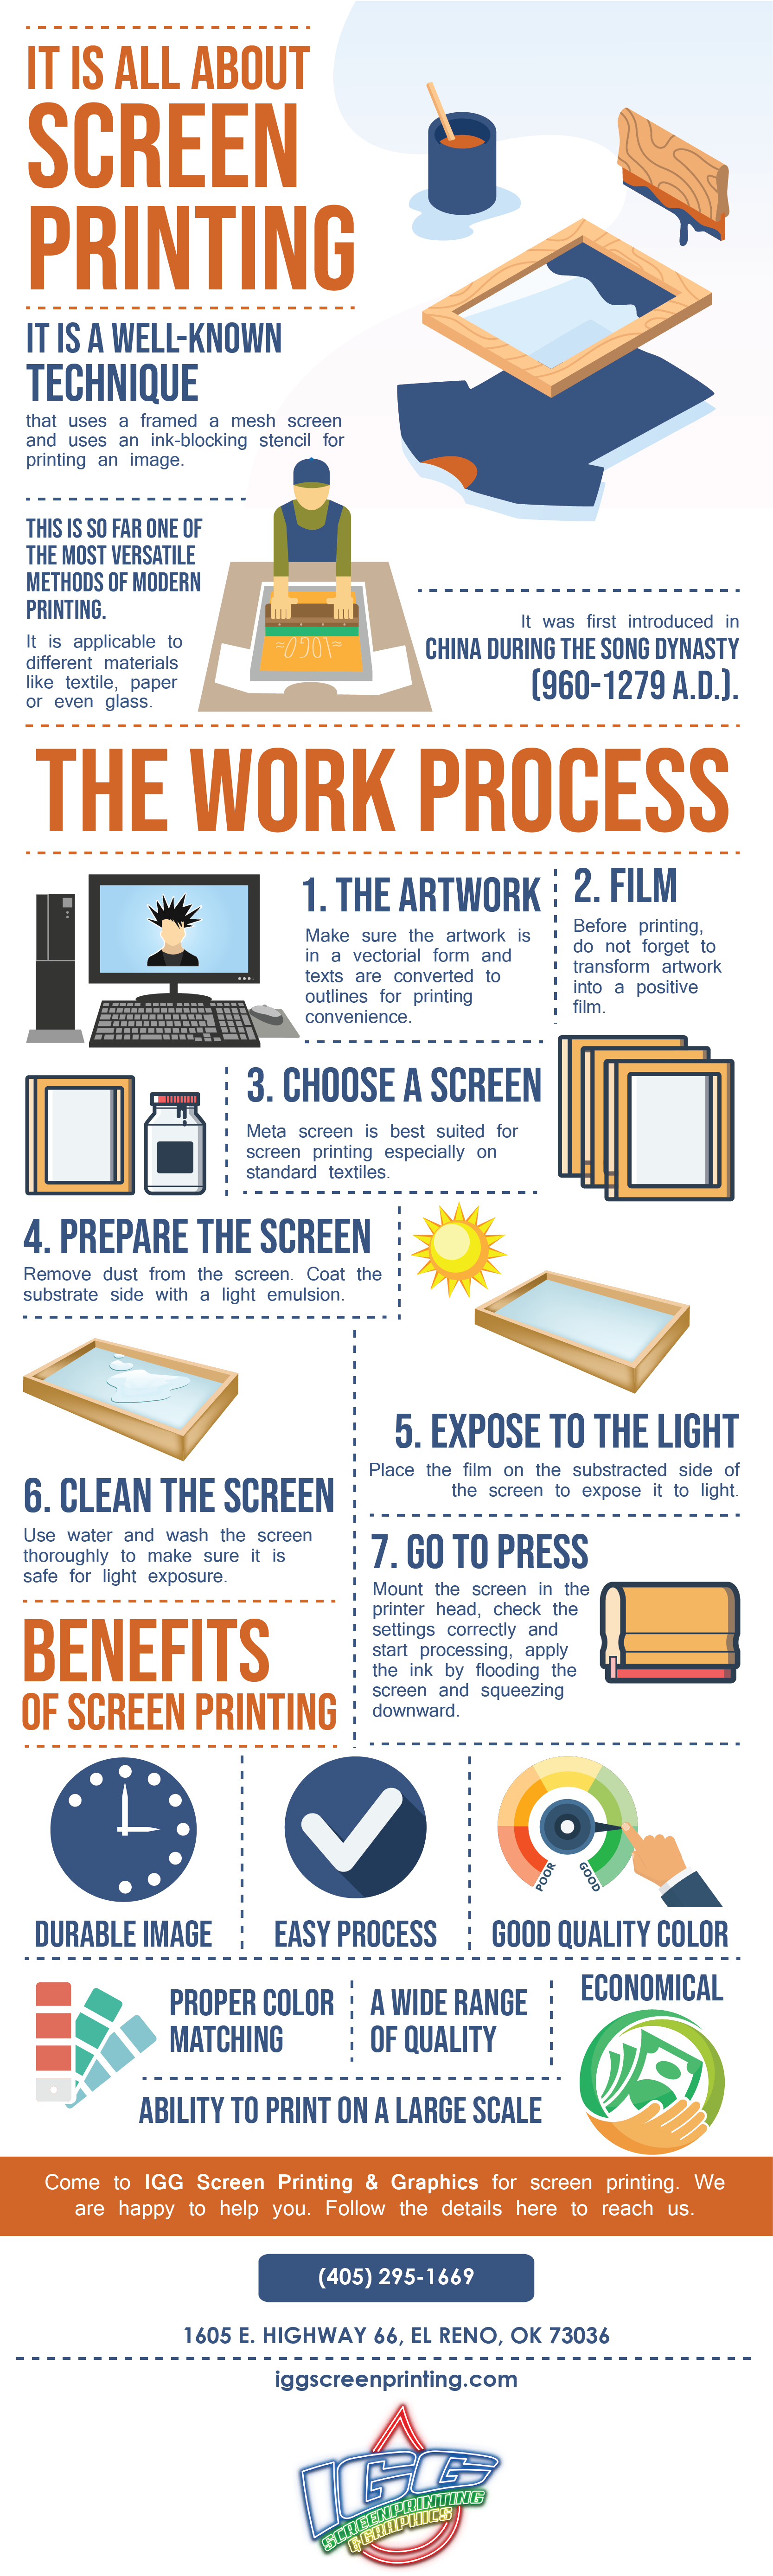 screen printing okc-IGG.png